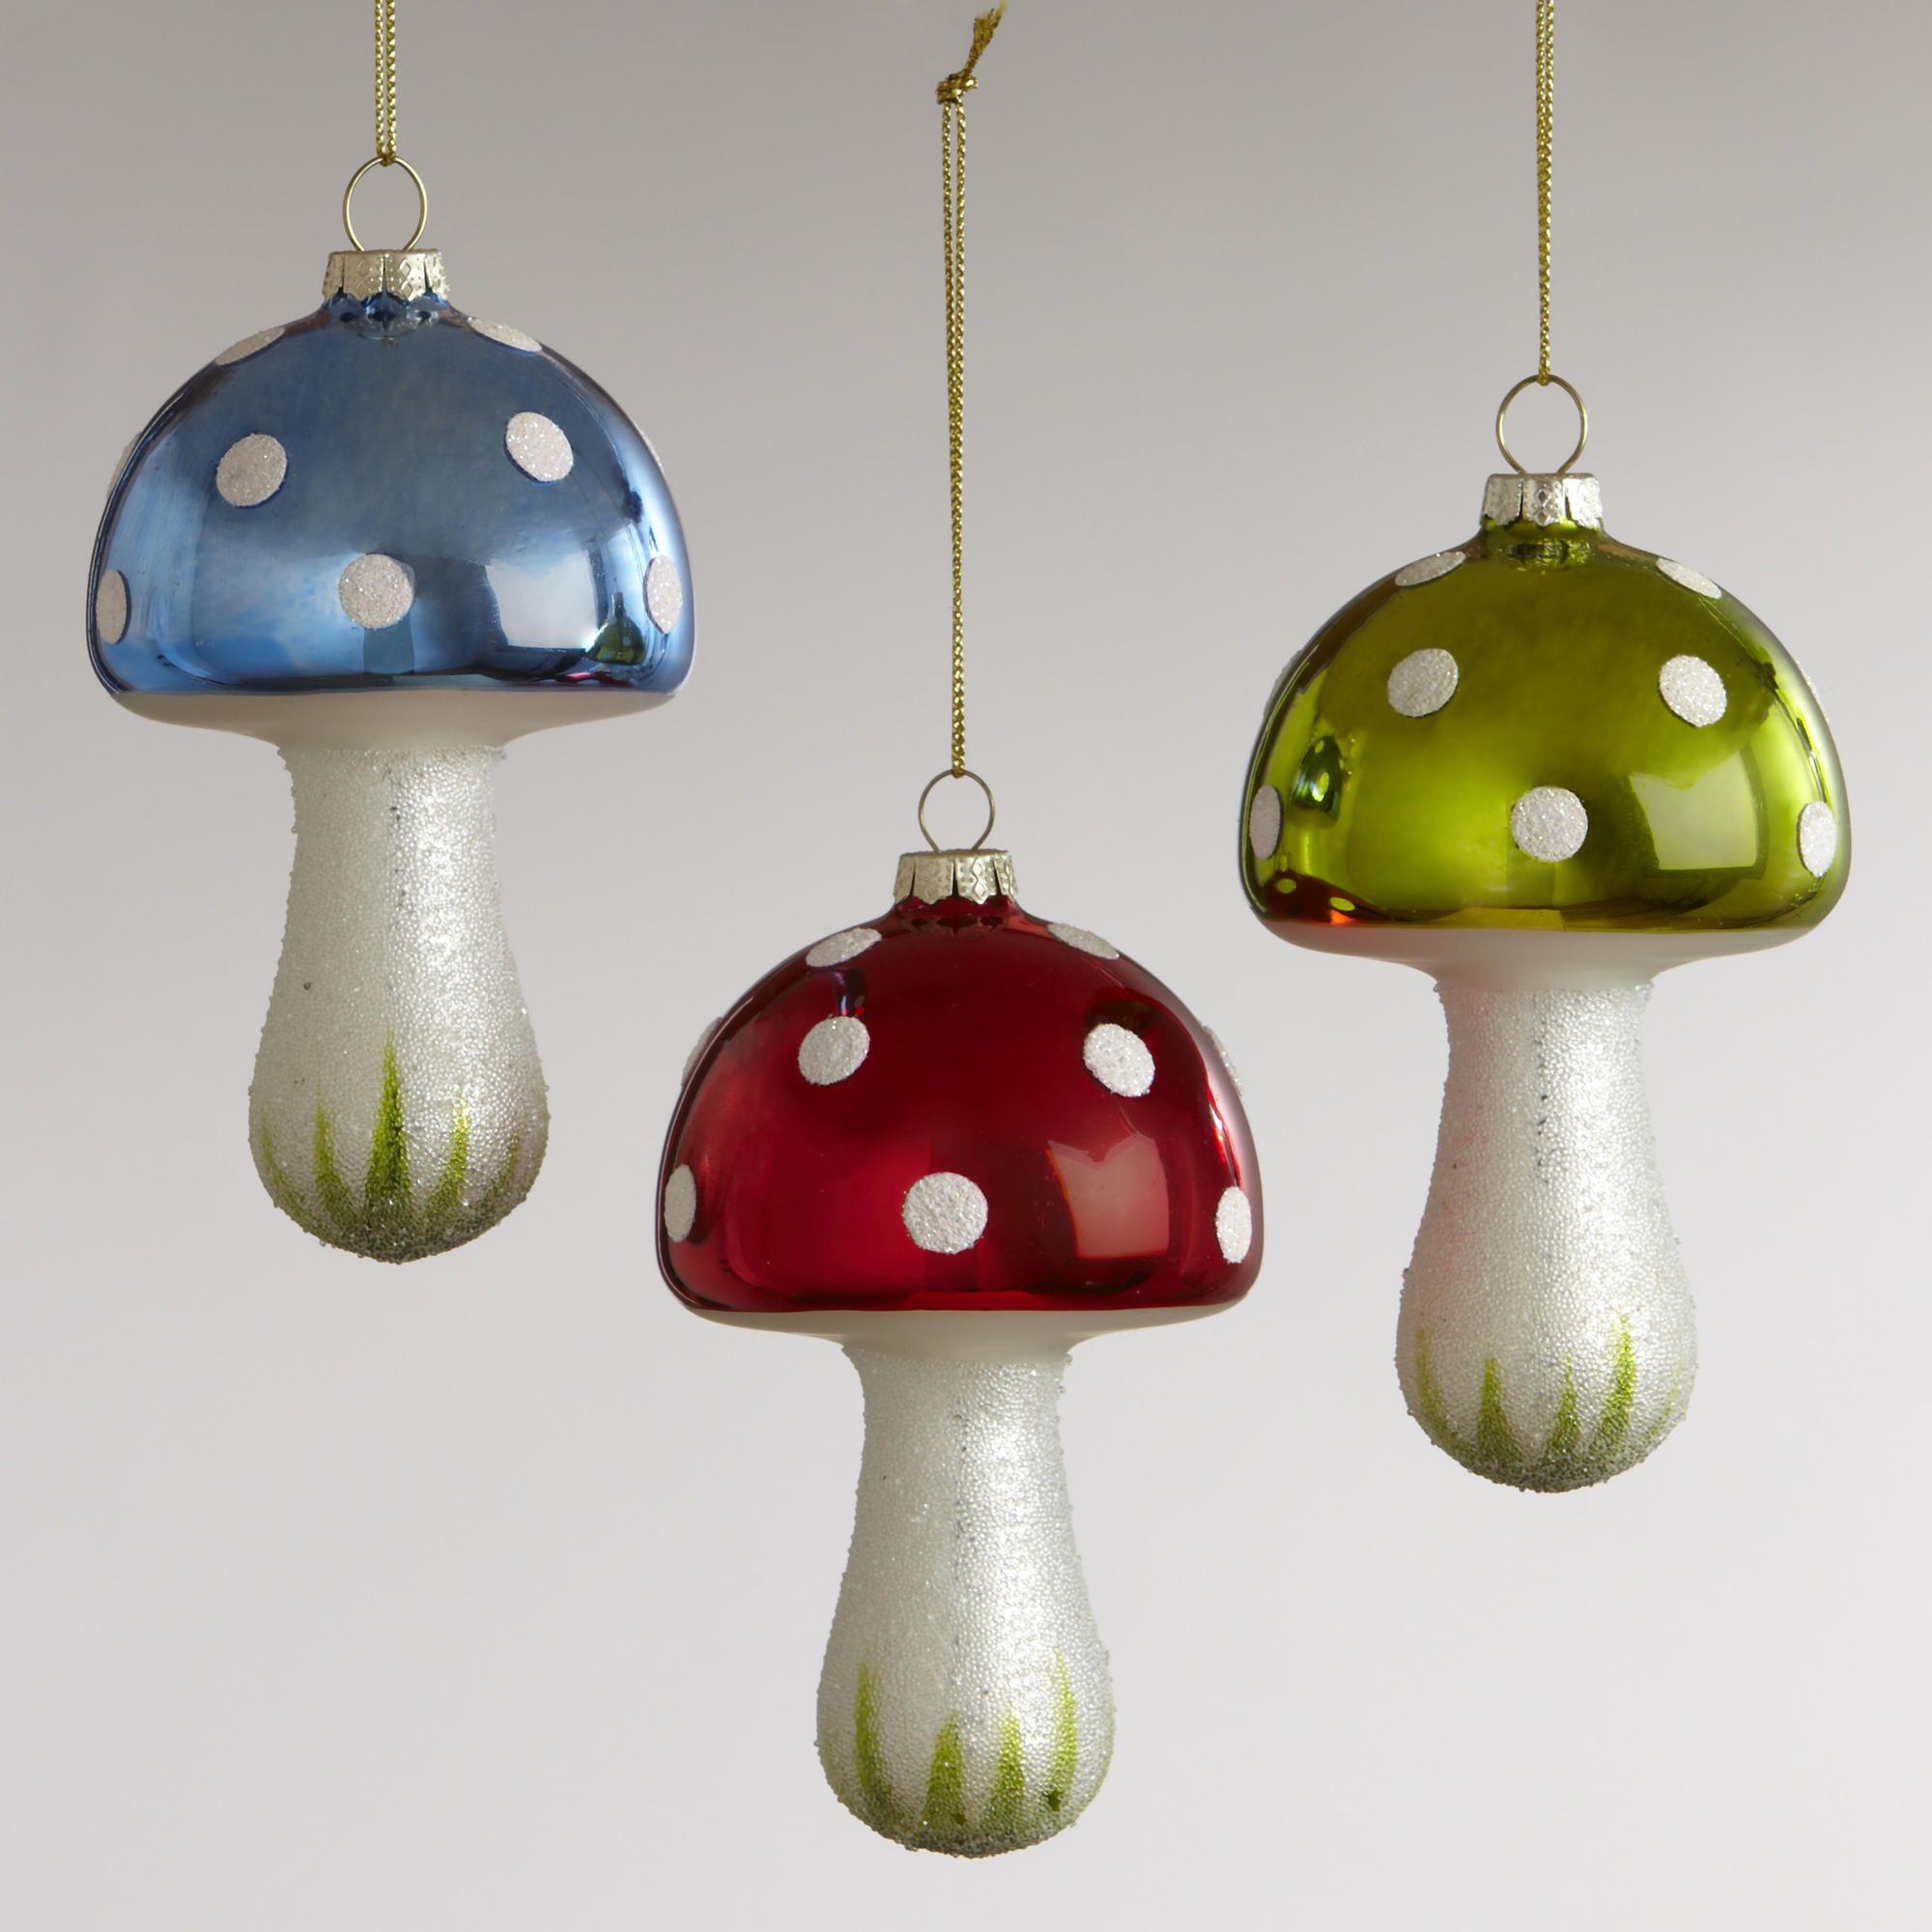 Glass Mushroom with Ice Ornaments Set of 3  World Market